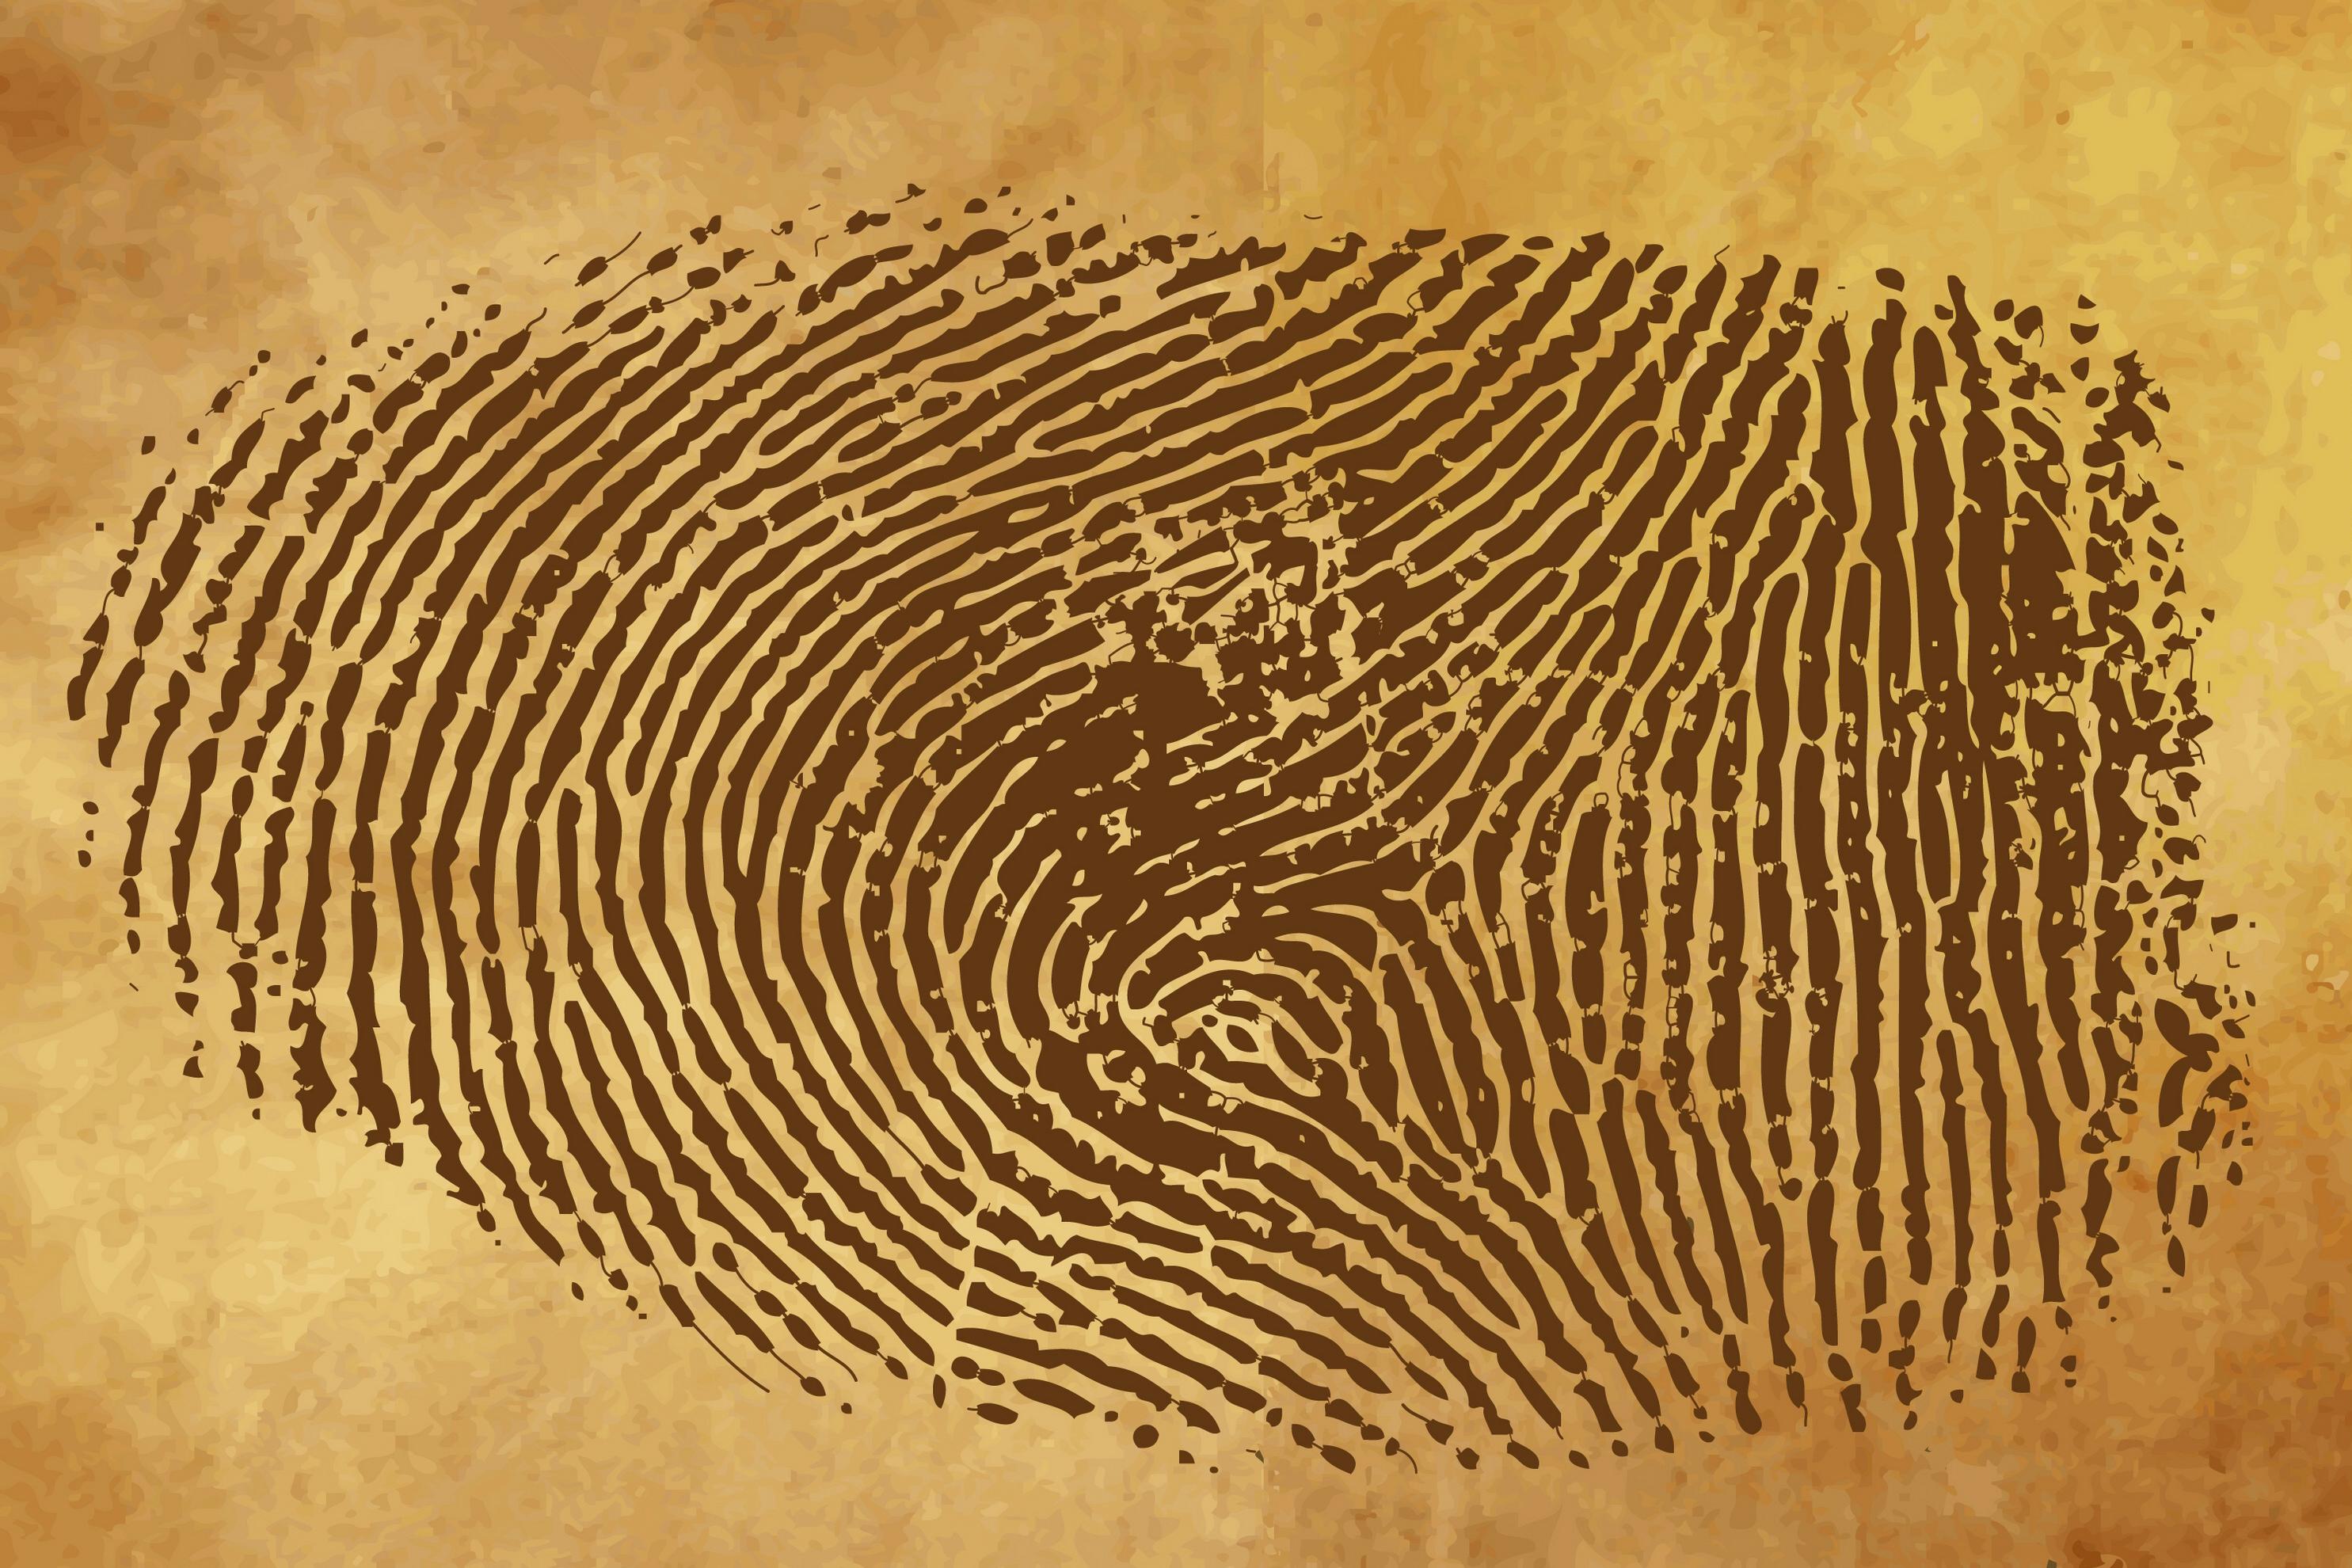 Fingerprint-dating tech could thwart lying criminals